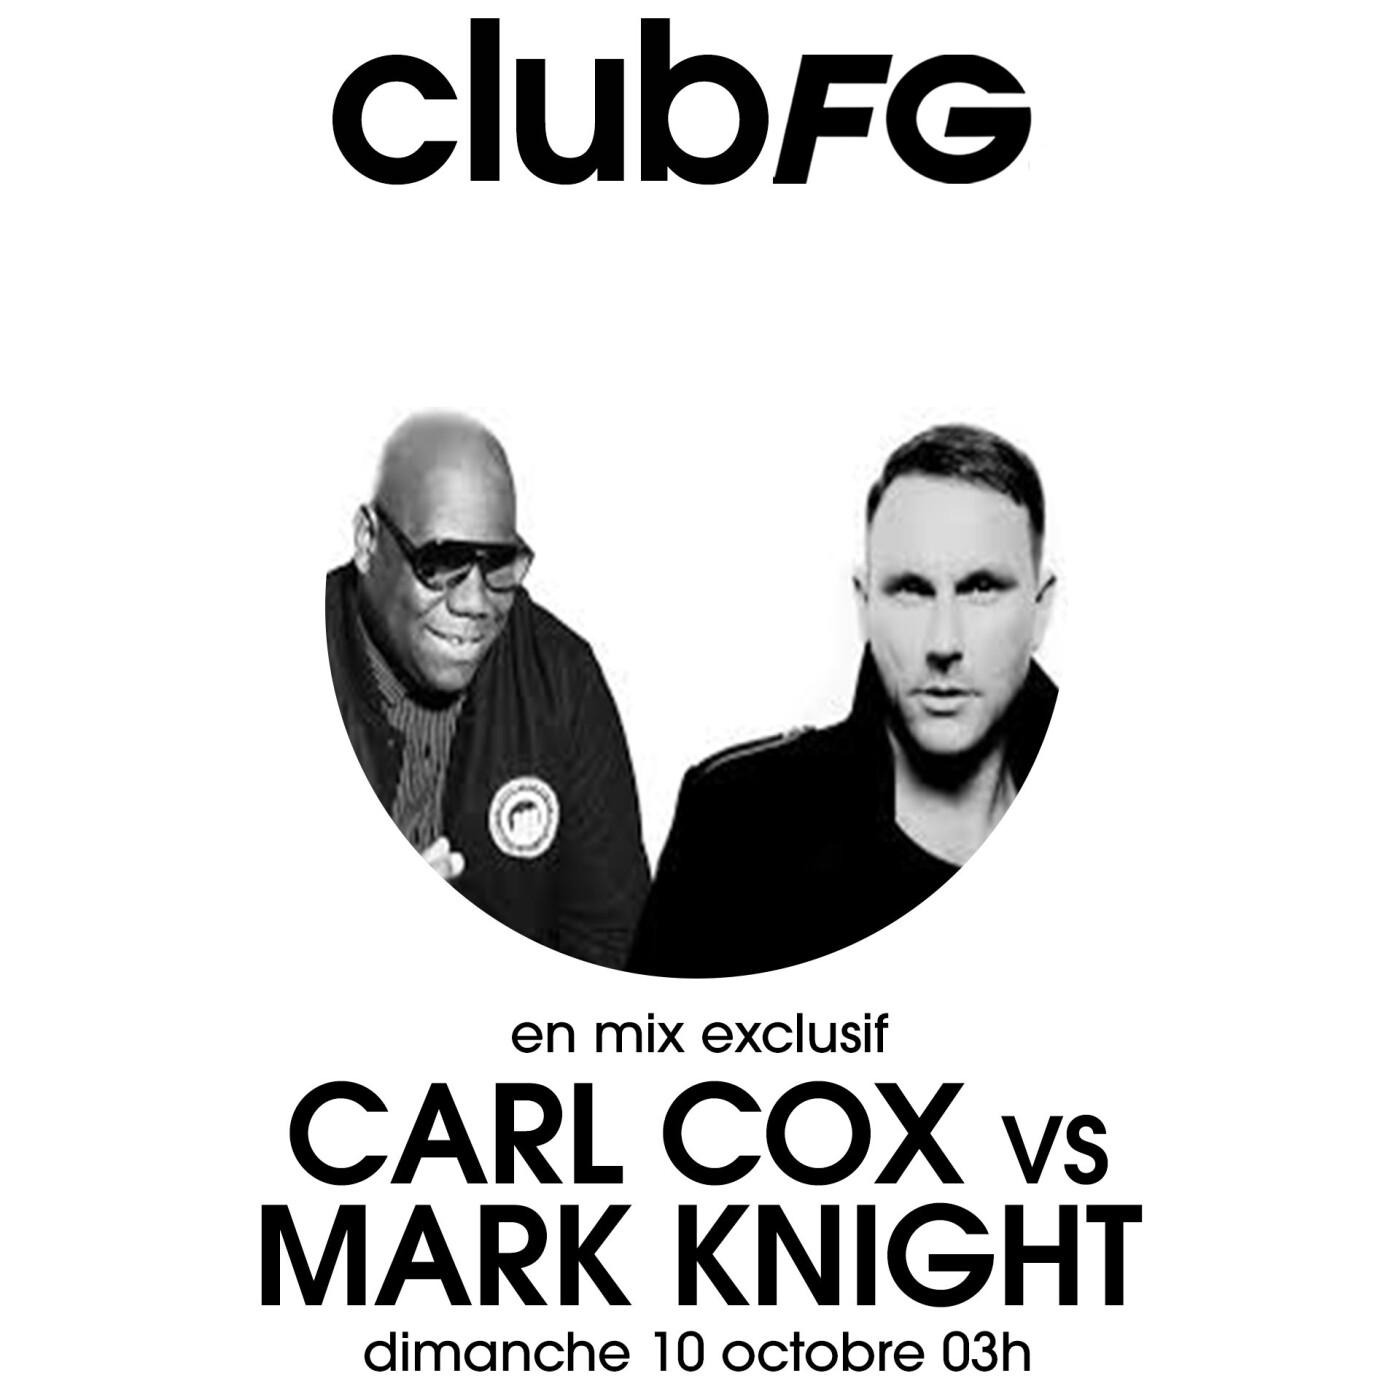 CLUB FG : CARL COX VS MARK KNIGHT